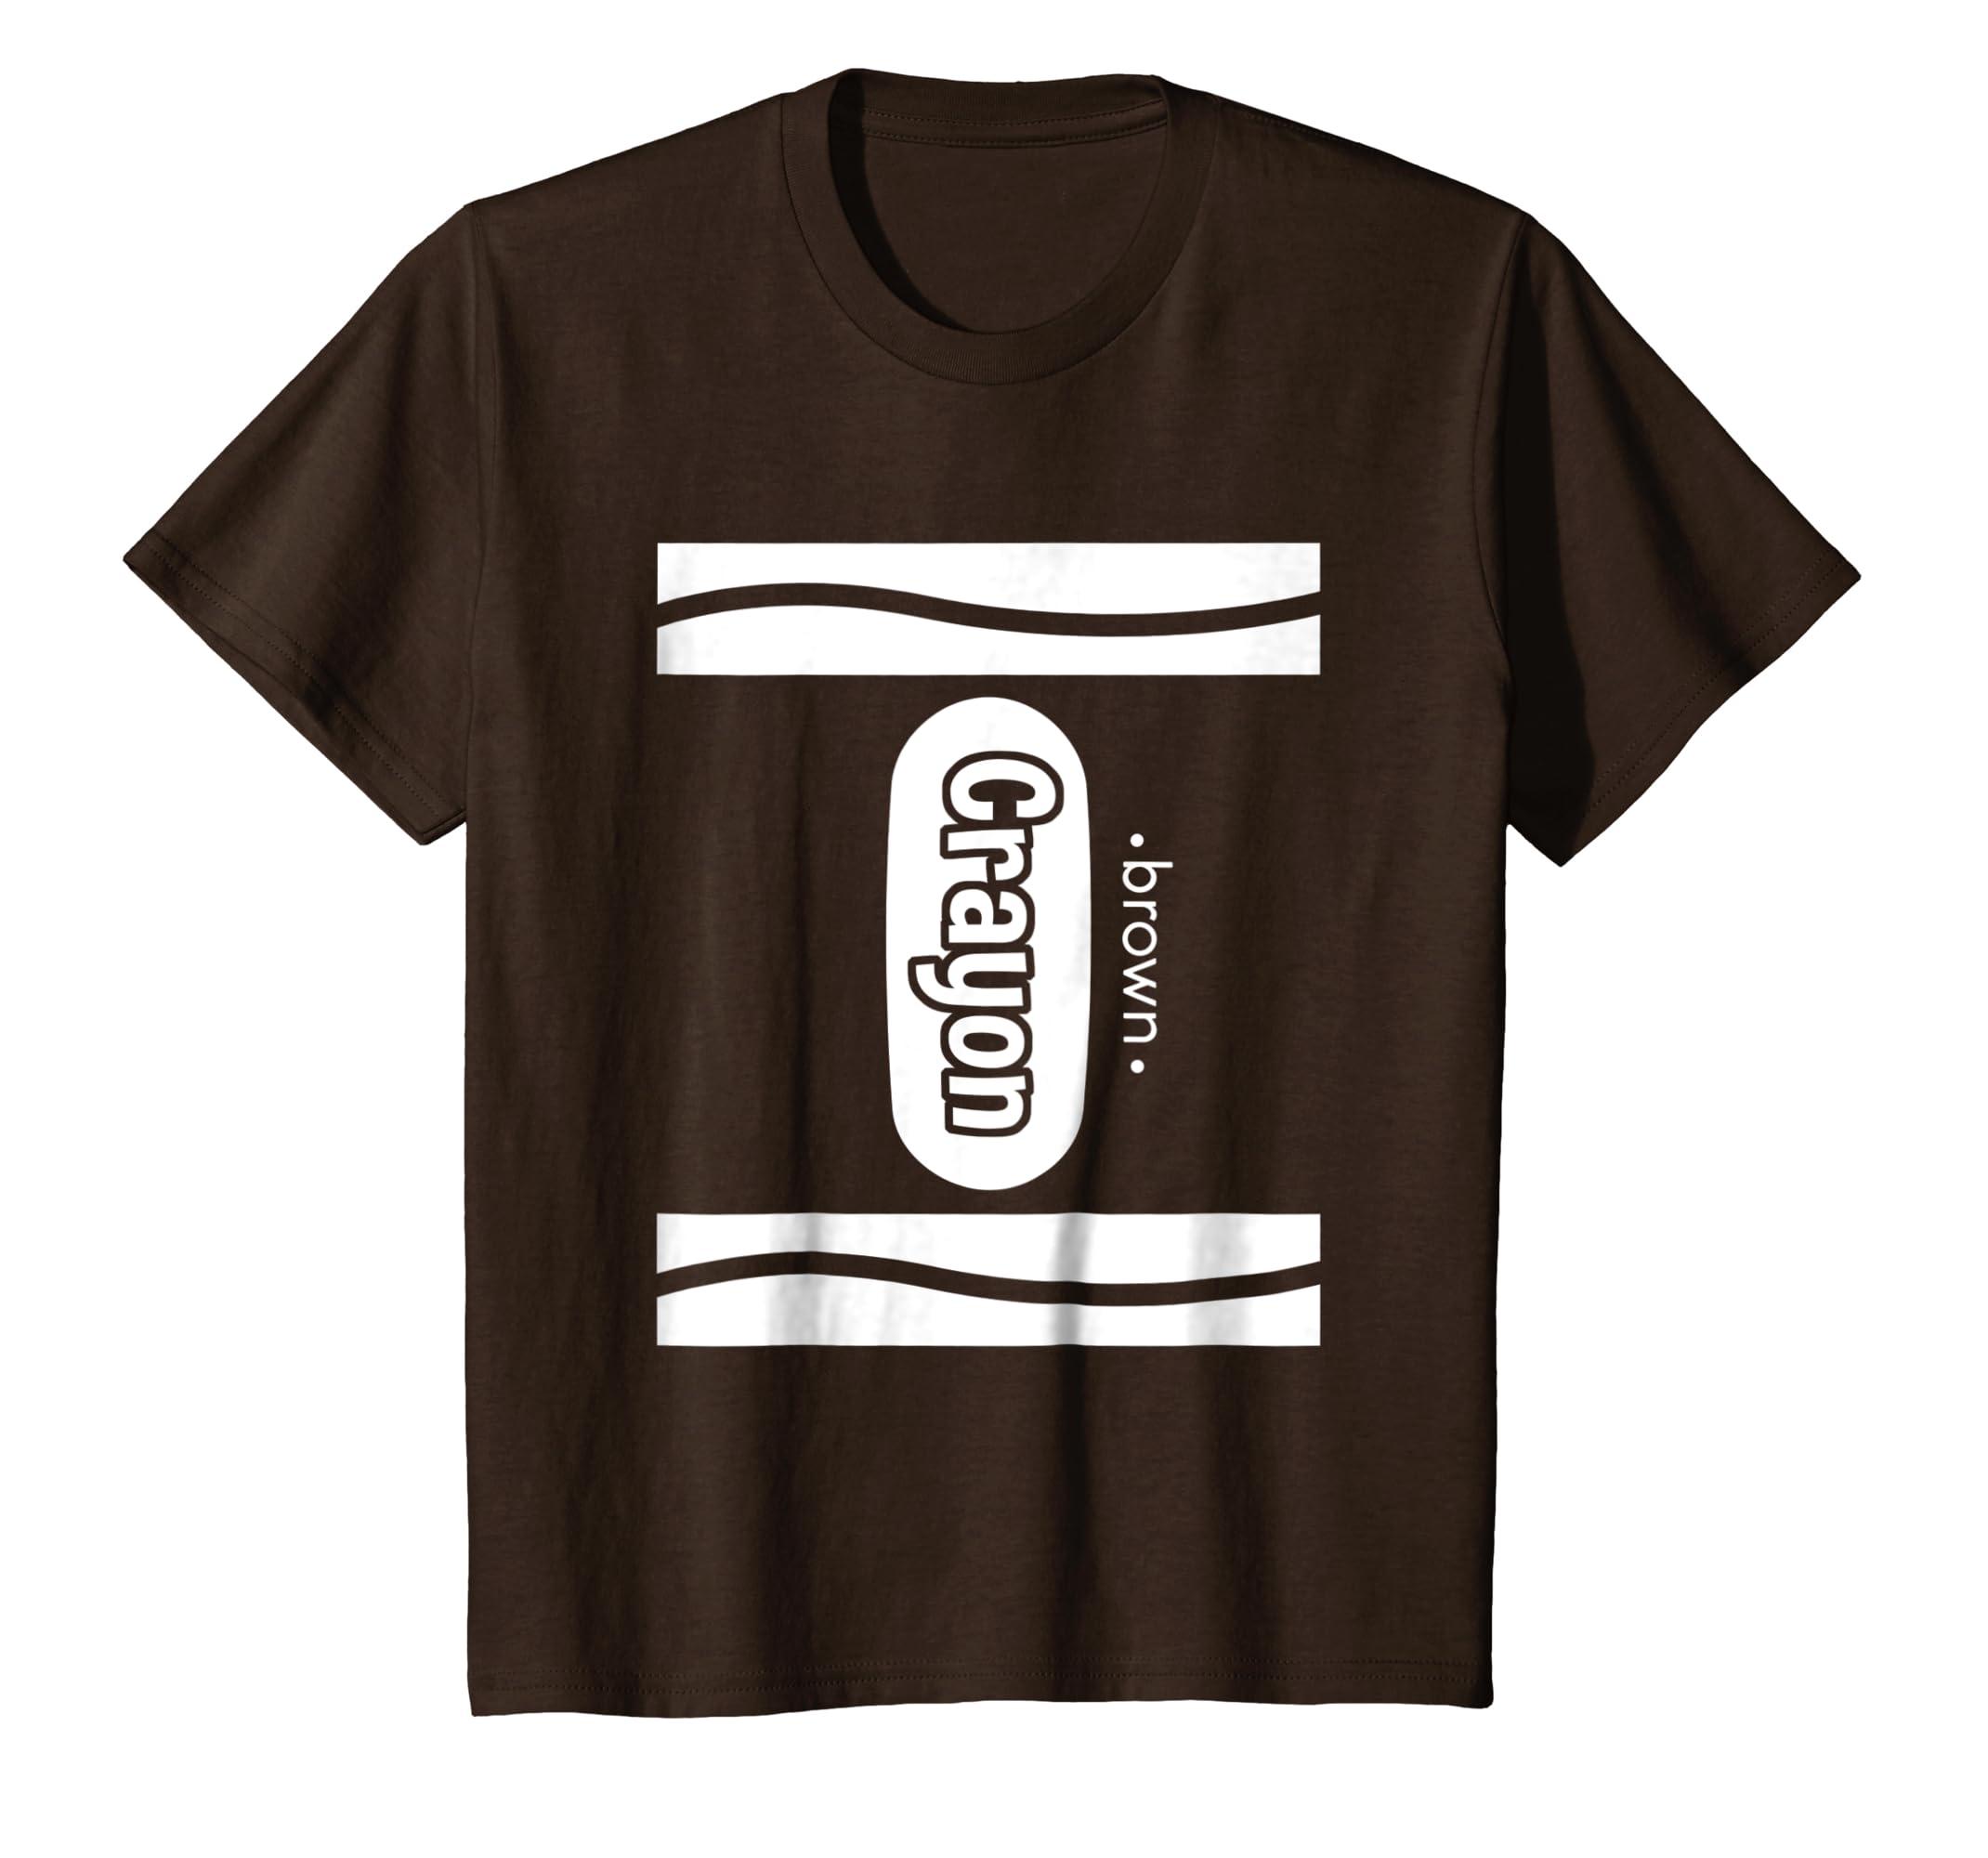 Brown Crayon Costume Shirt